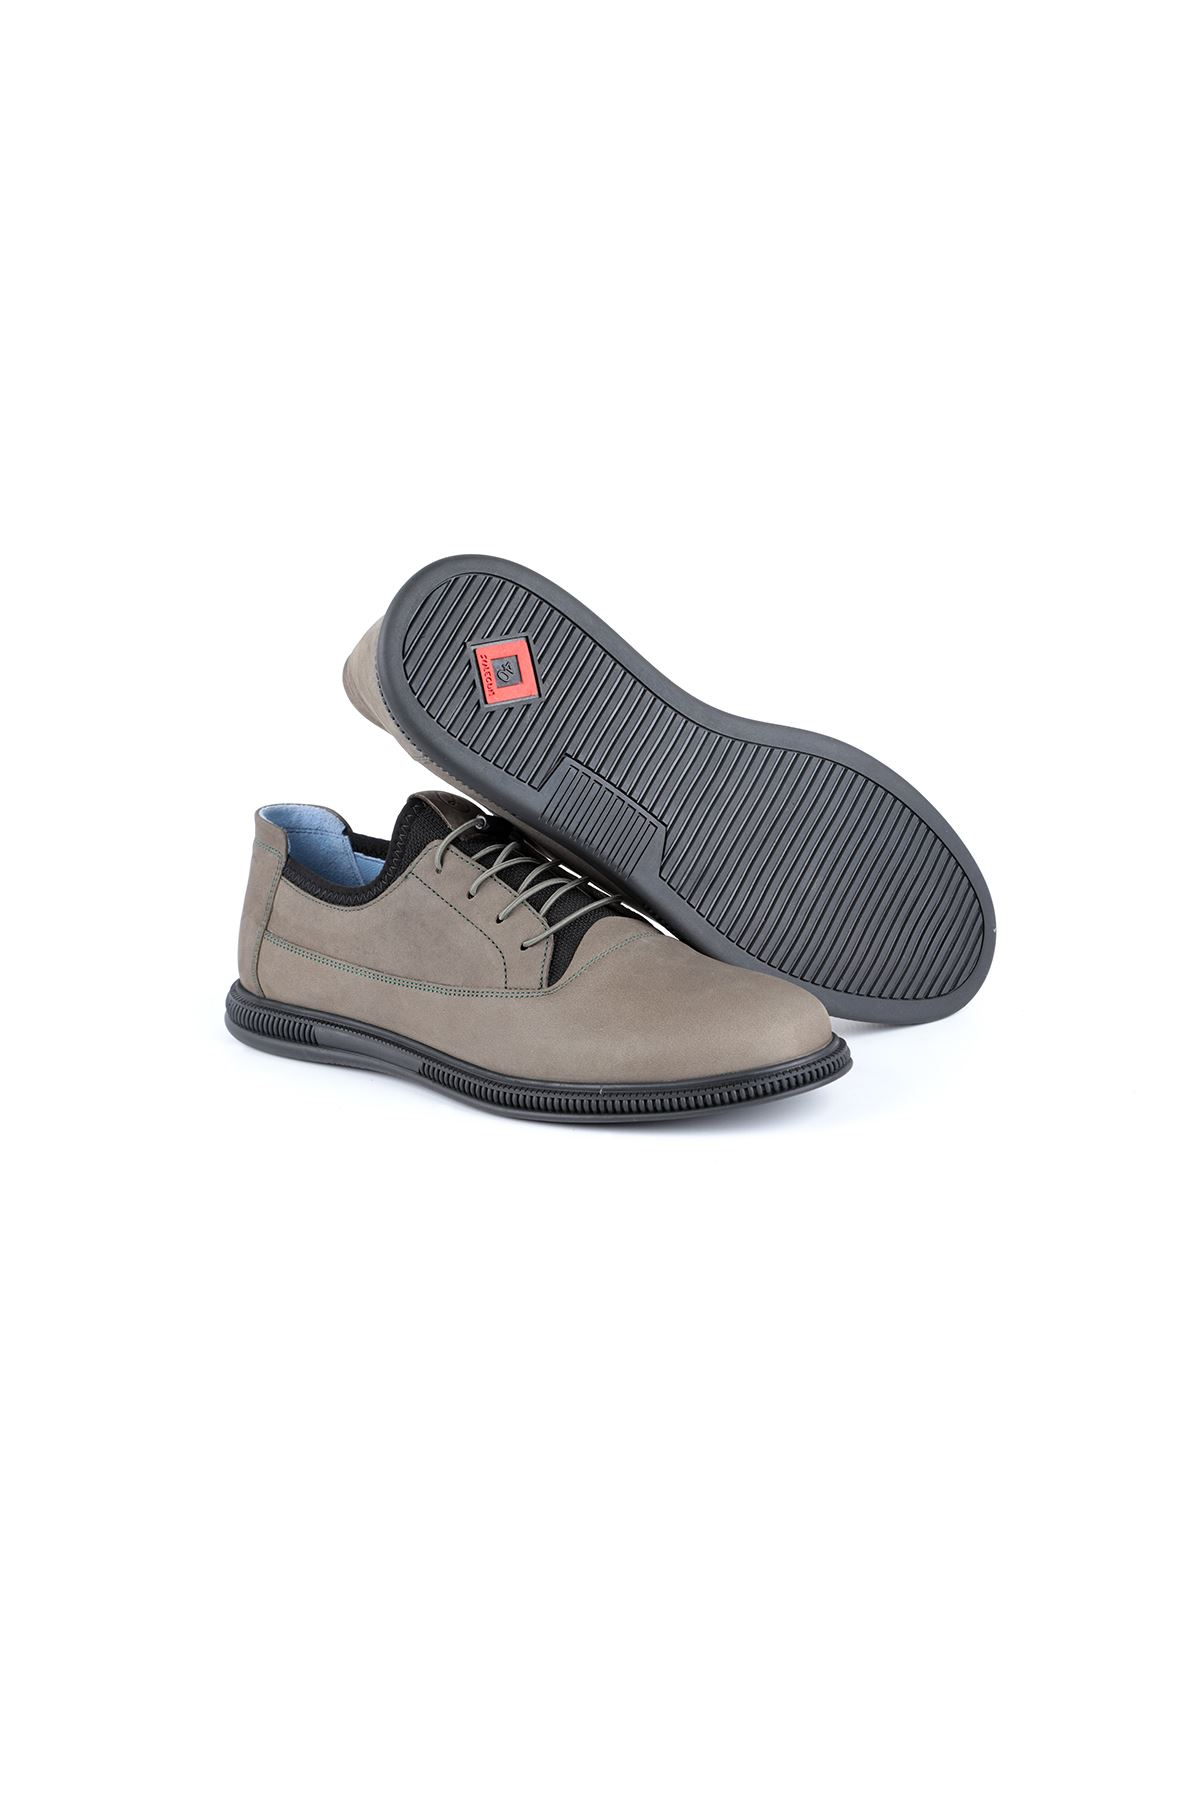 Libero L3726 Khaki Casual Men Shoes